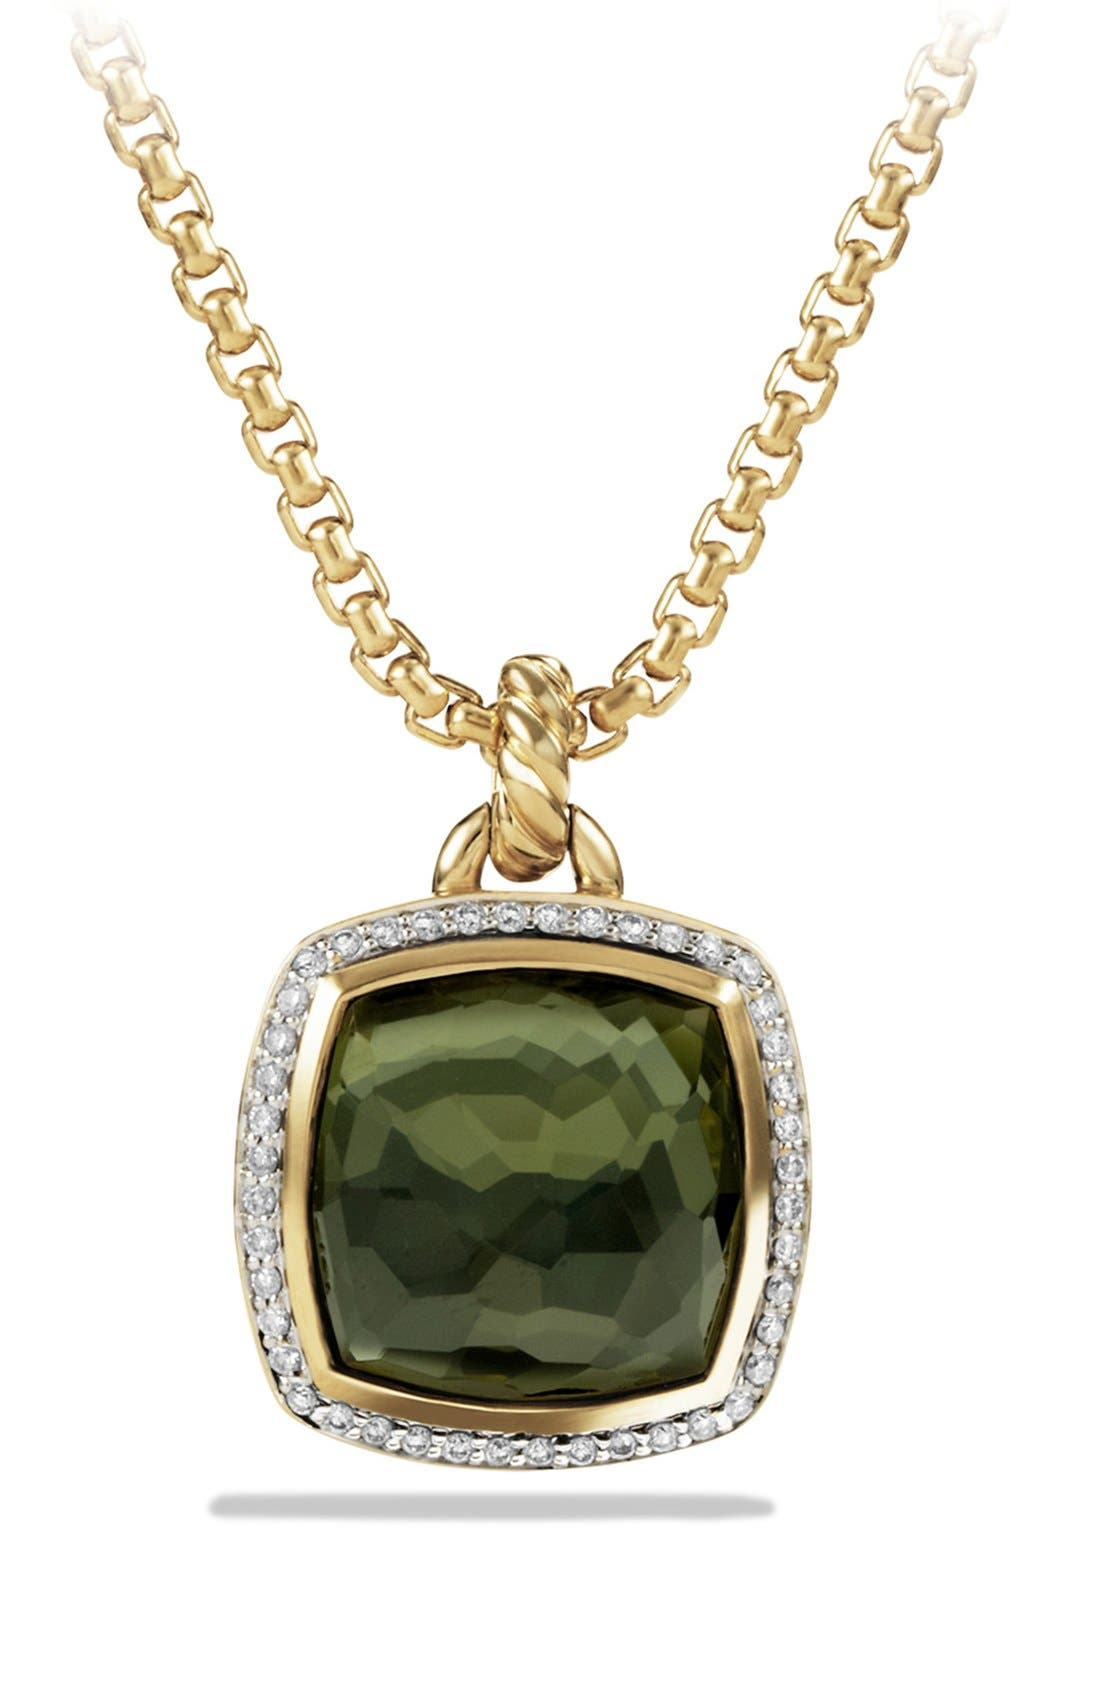 Alternate Image 1 Selected - David Yurman 'Albion' Pendant with Lemon Citrine and Diamonds in Gold